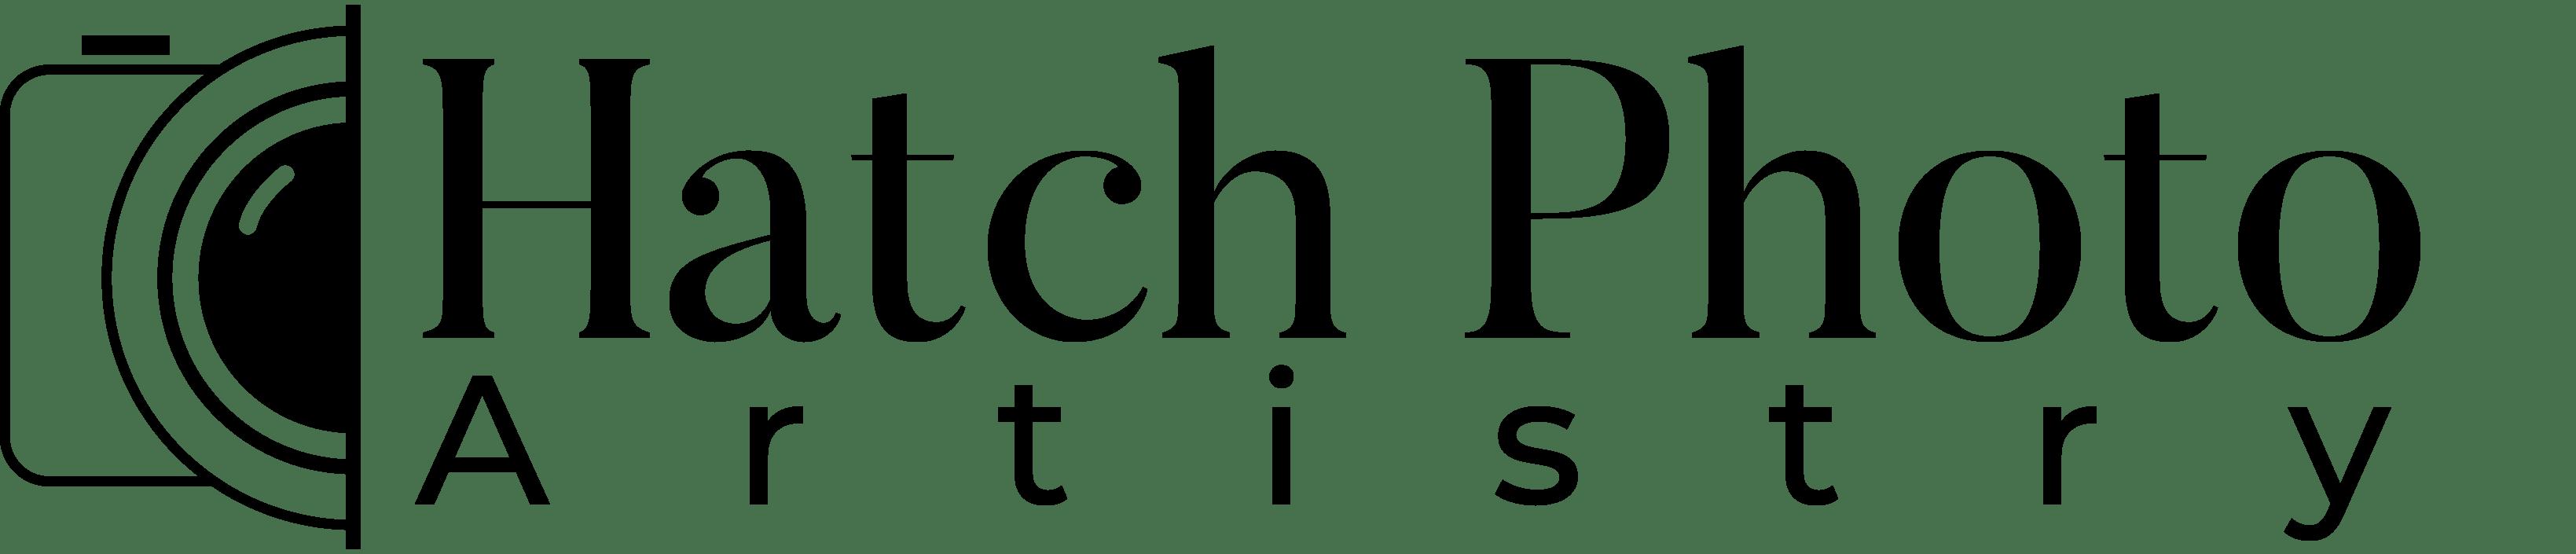 Eric Hatch